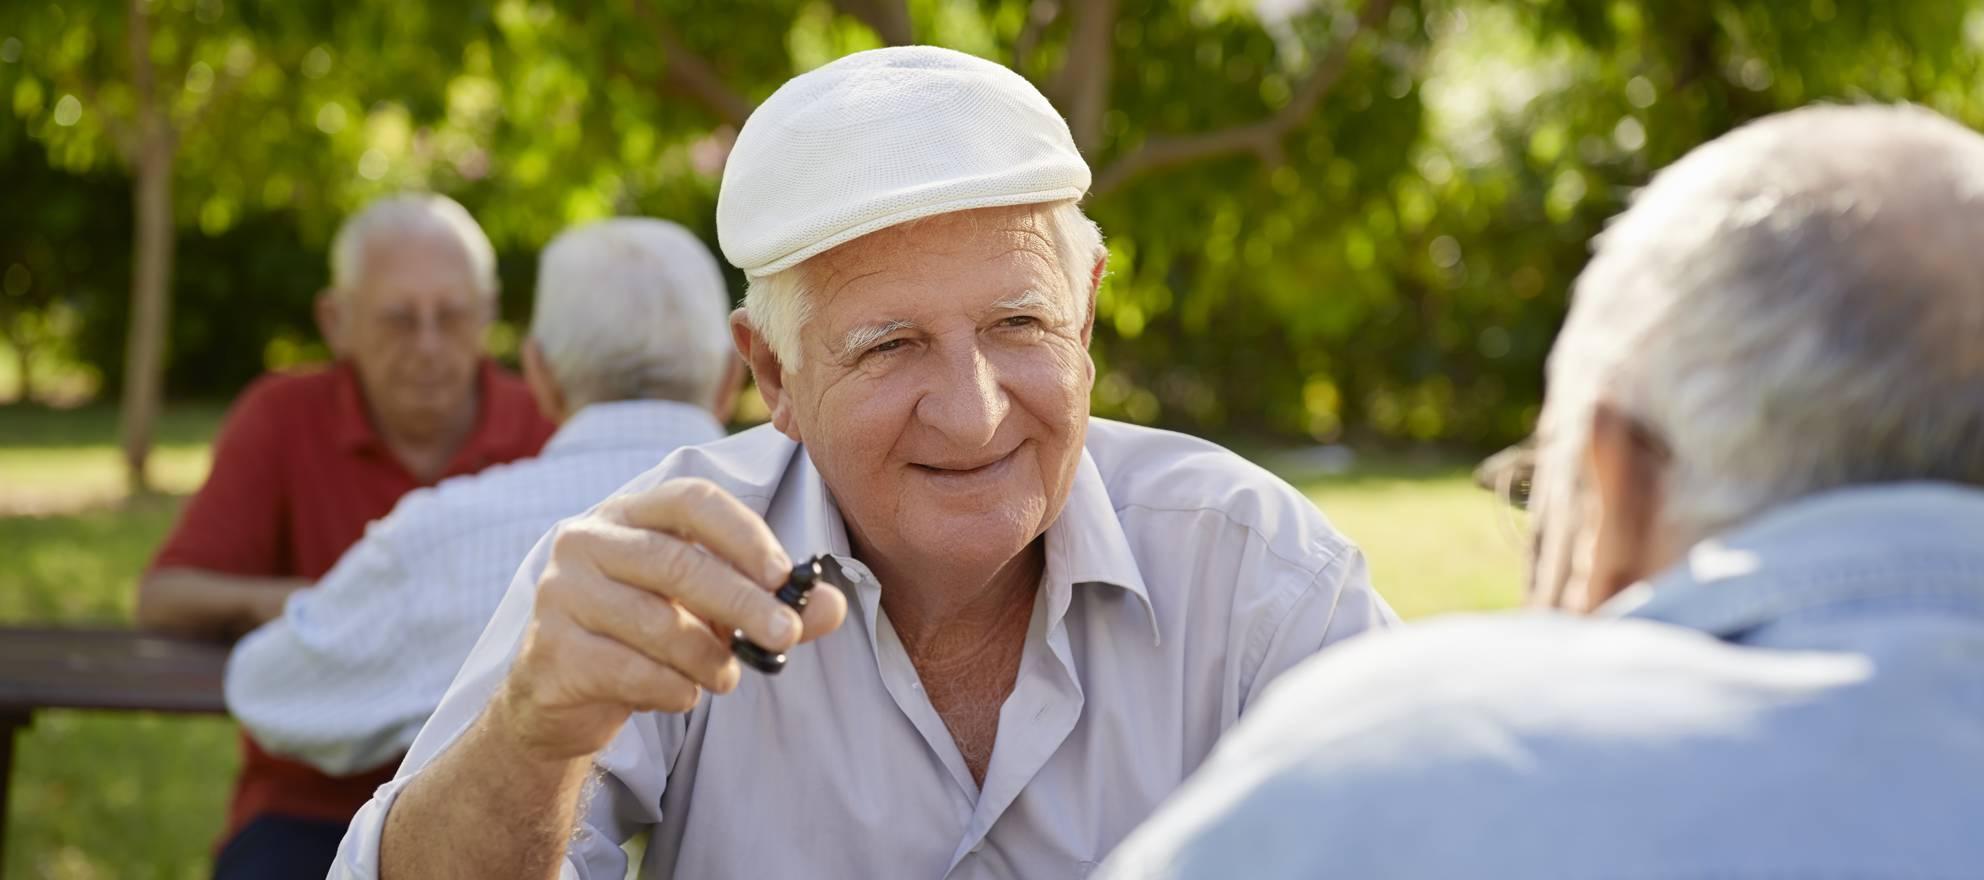 Podcast: Turn today's success into career longevity